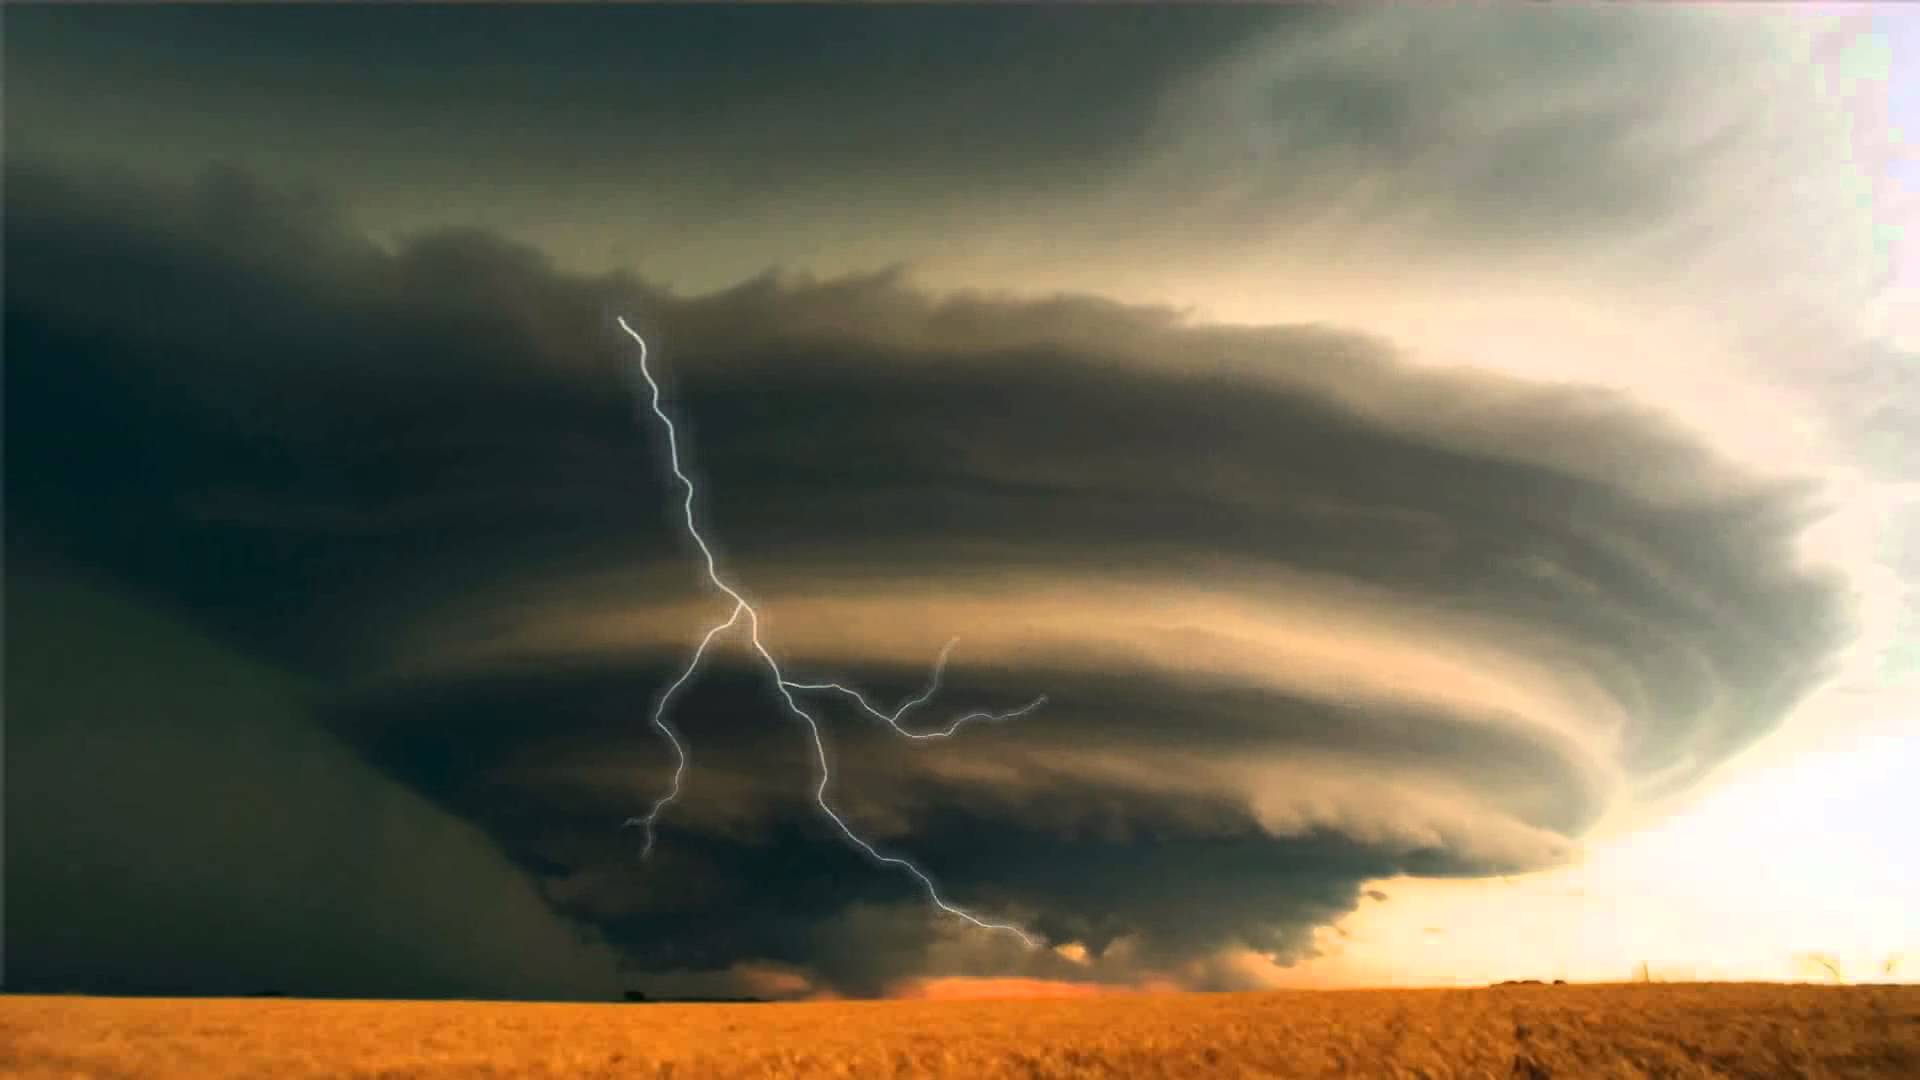 tornado lightning storm live wallpaper for android